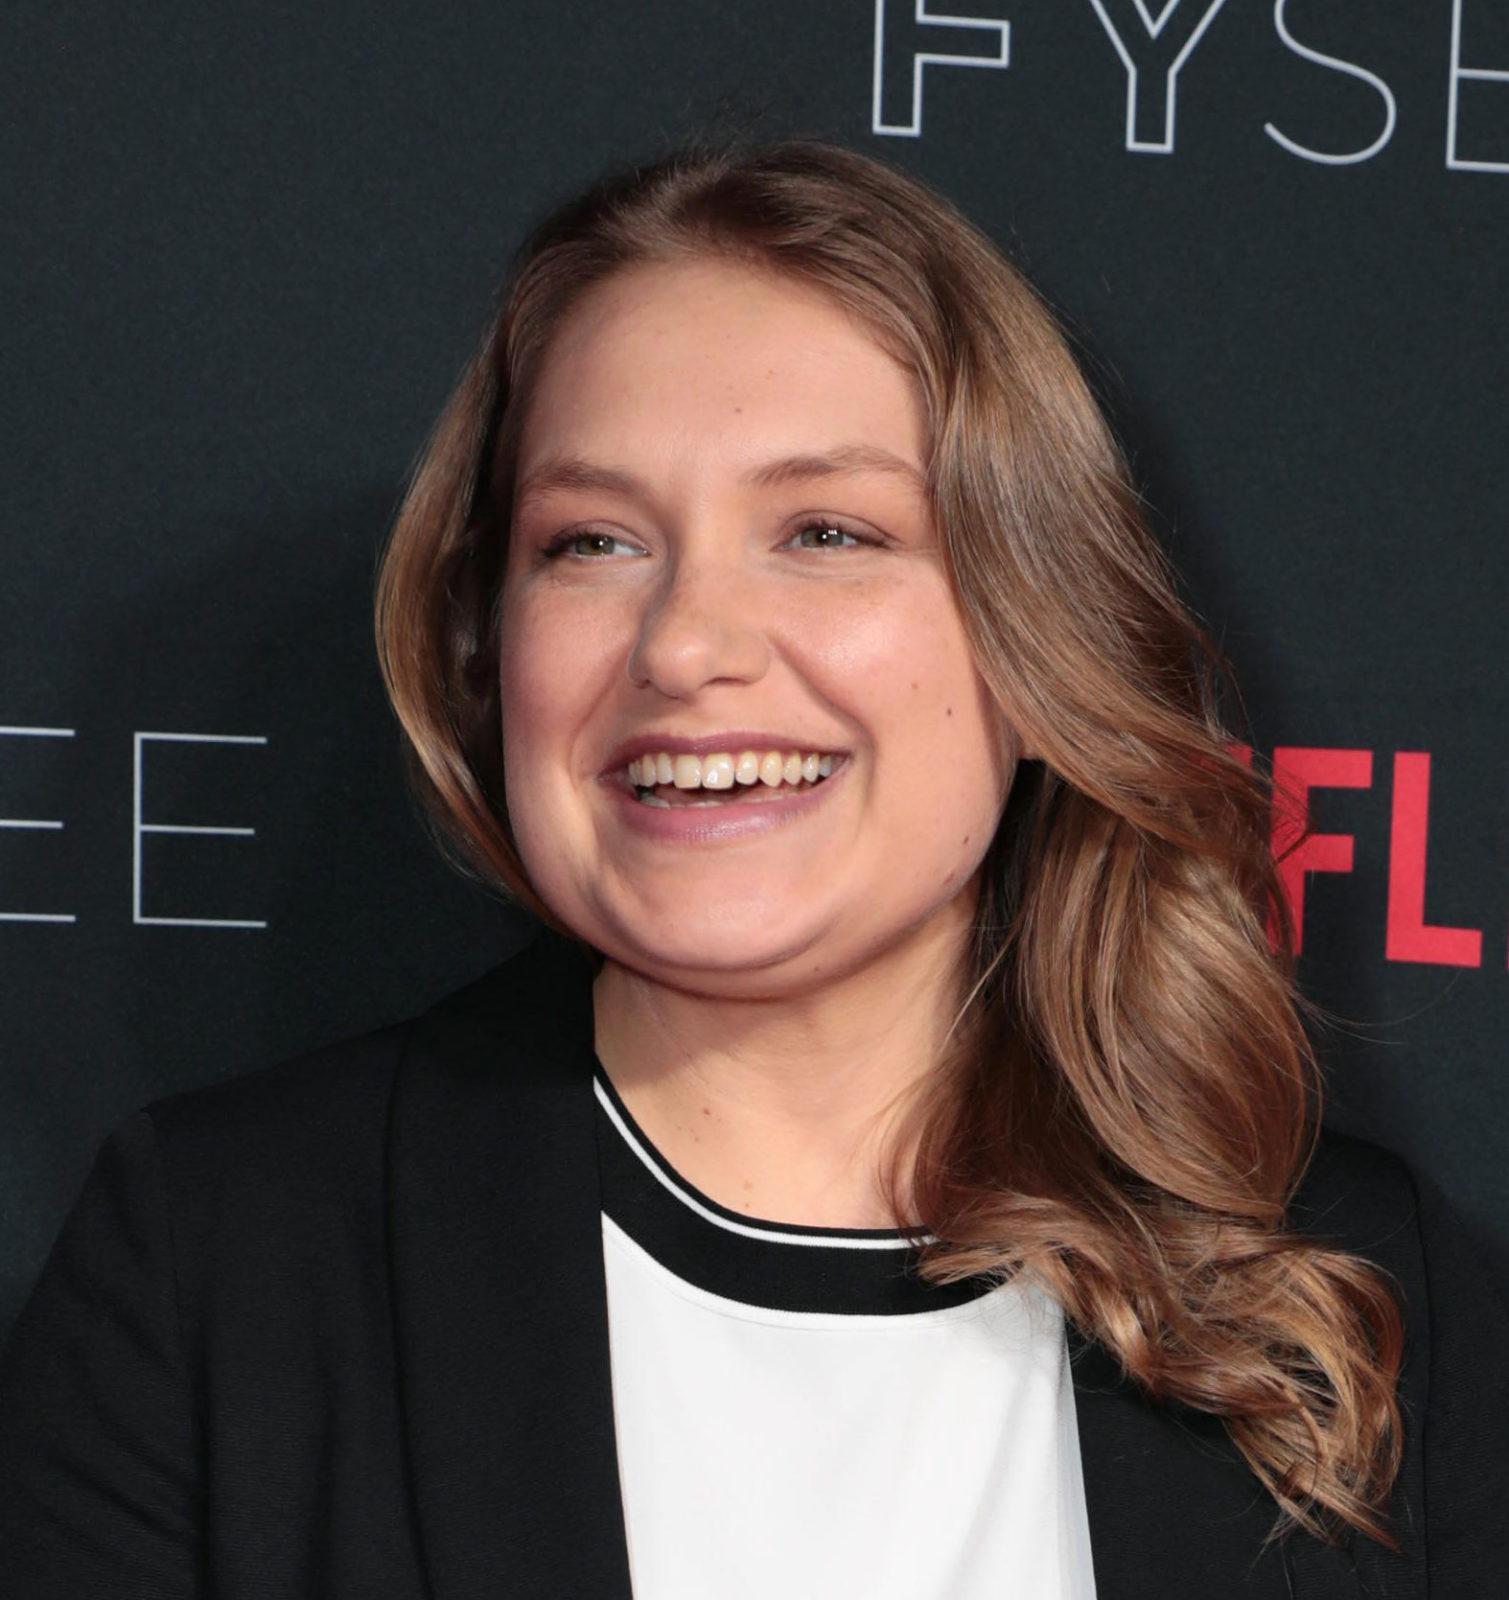 Netflix FYSEE Godless Panel, Los Angeles, CA, USA - 9 June 2018